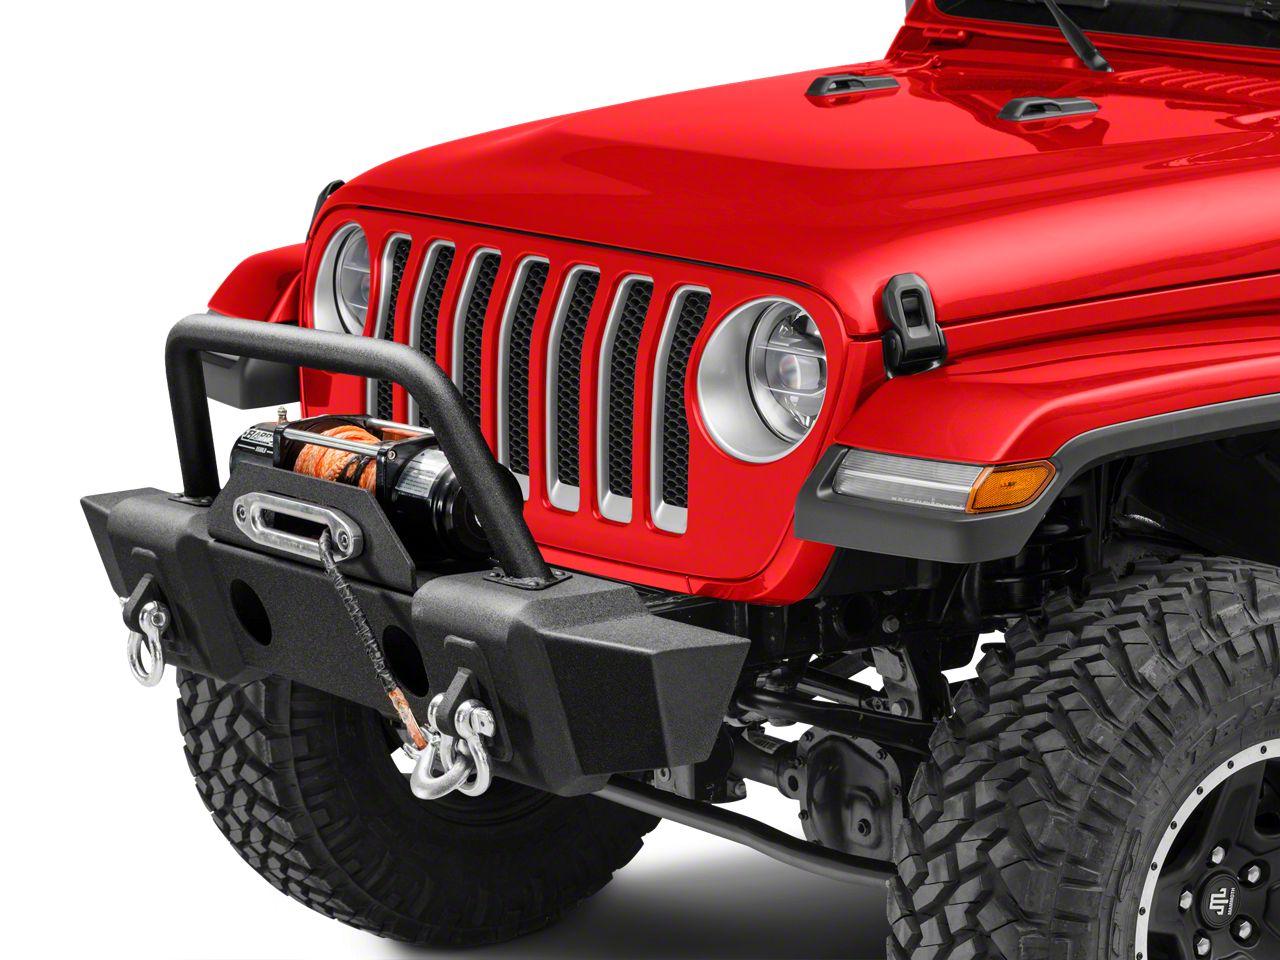 RedRock 4x4 Front Bumper w/ Grille Guard & Winch Mount (2018 Jeep Wrangler JL)